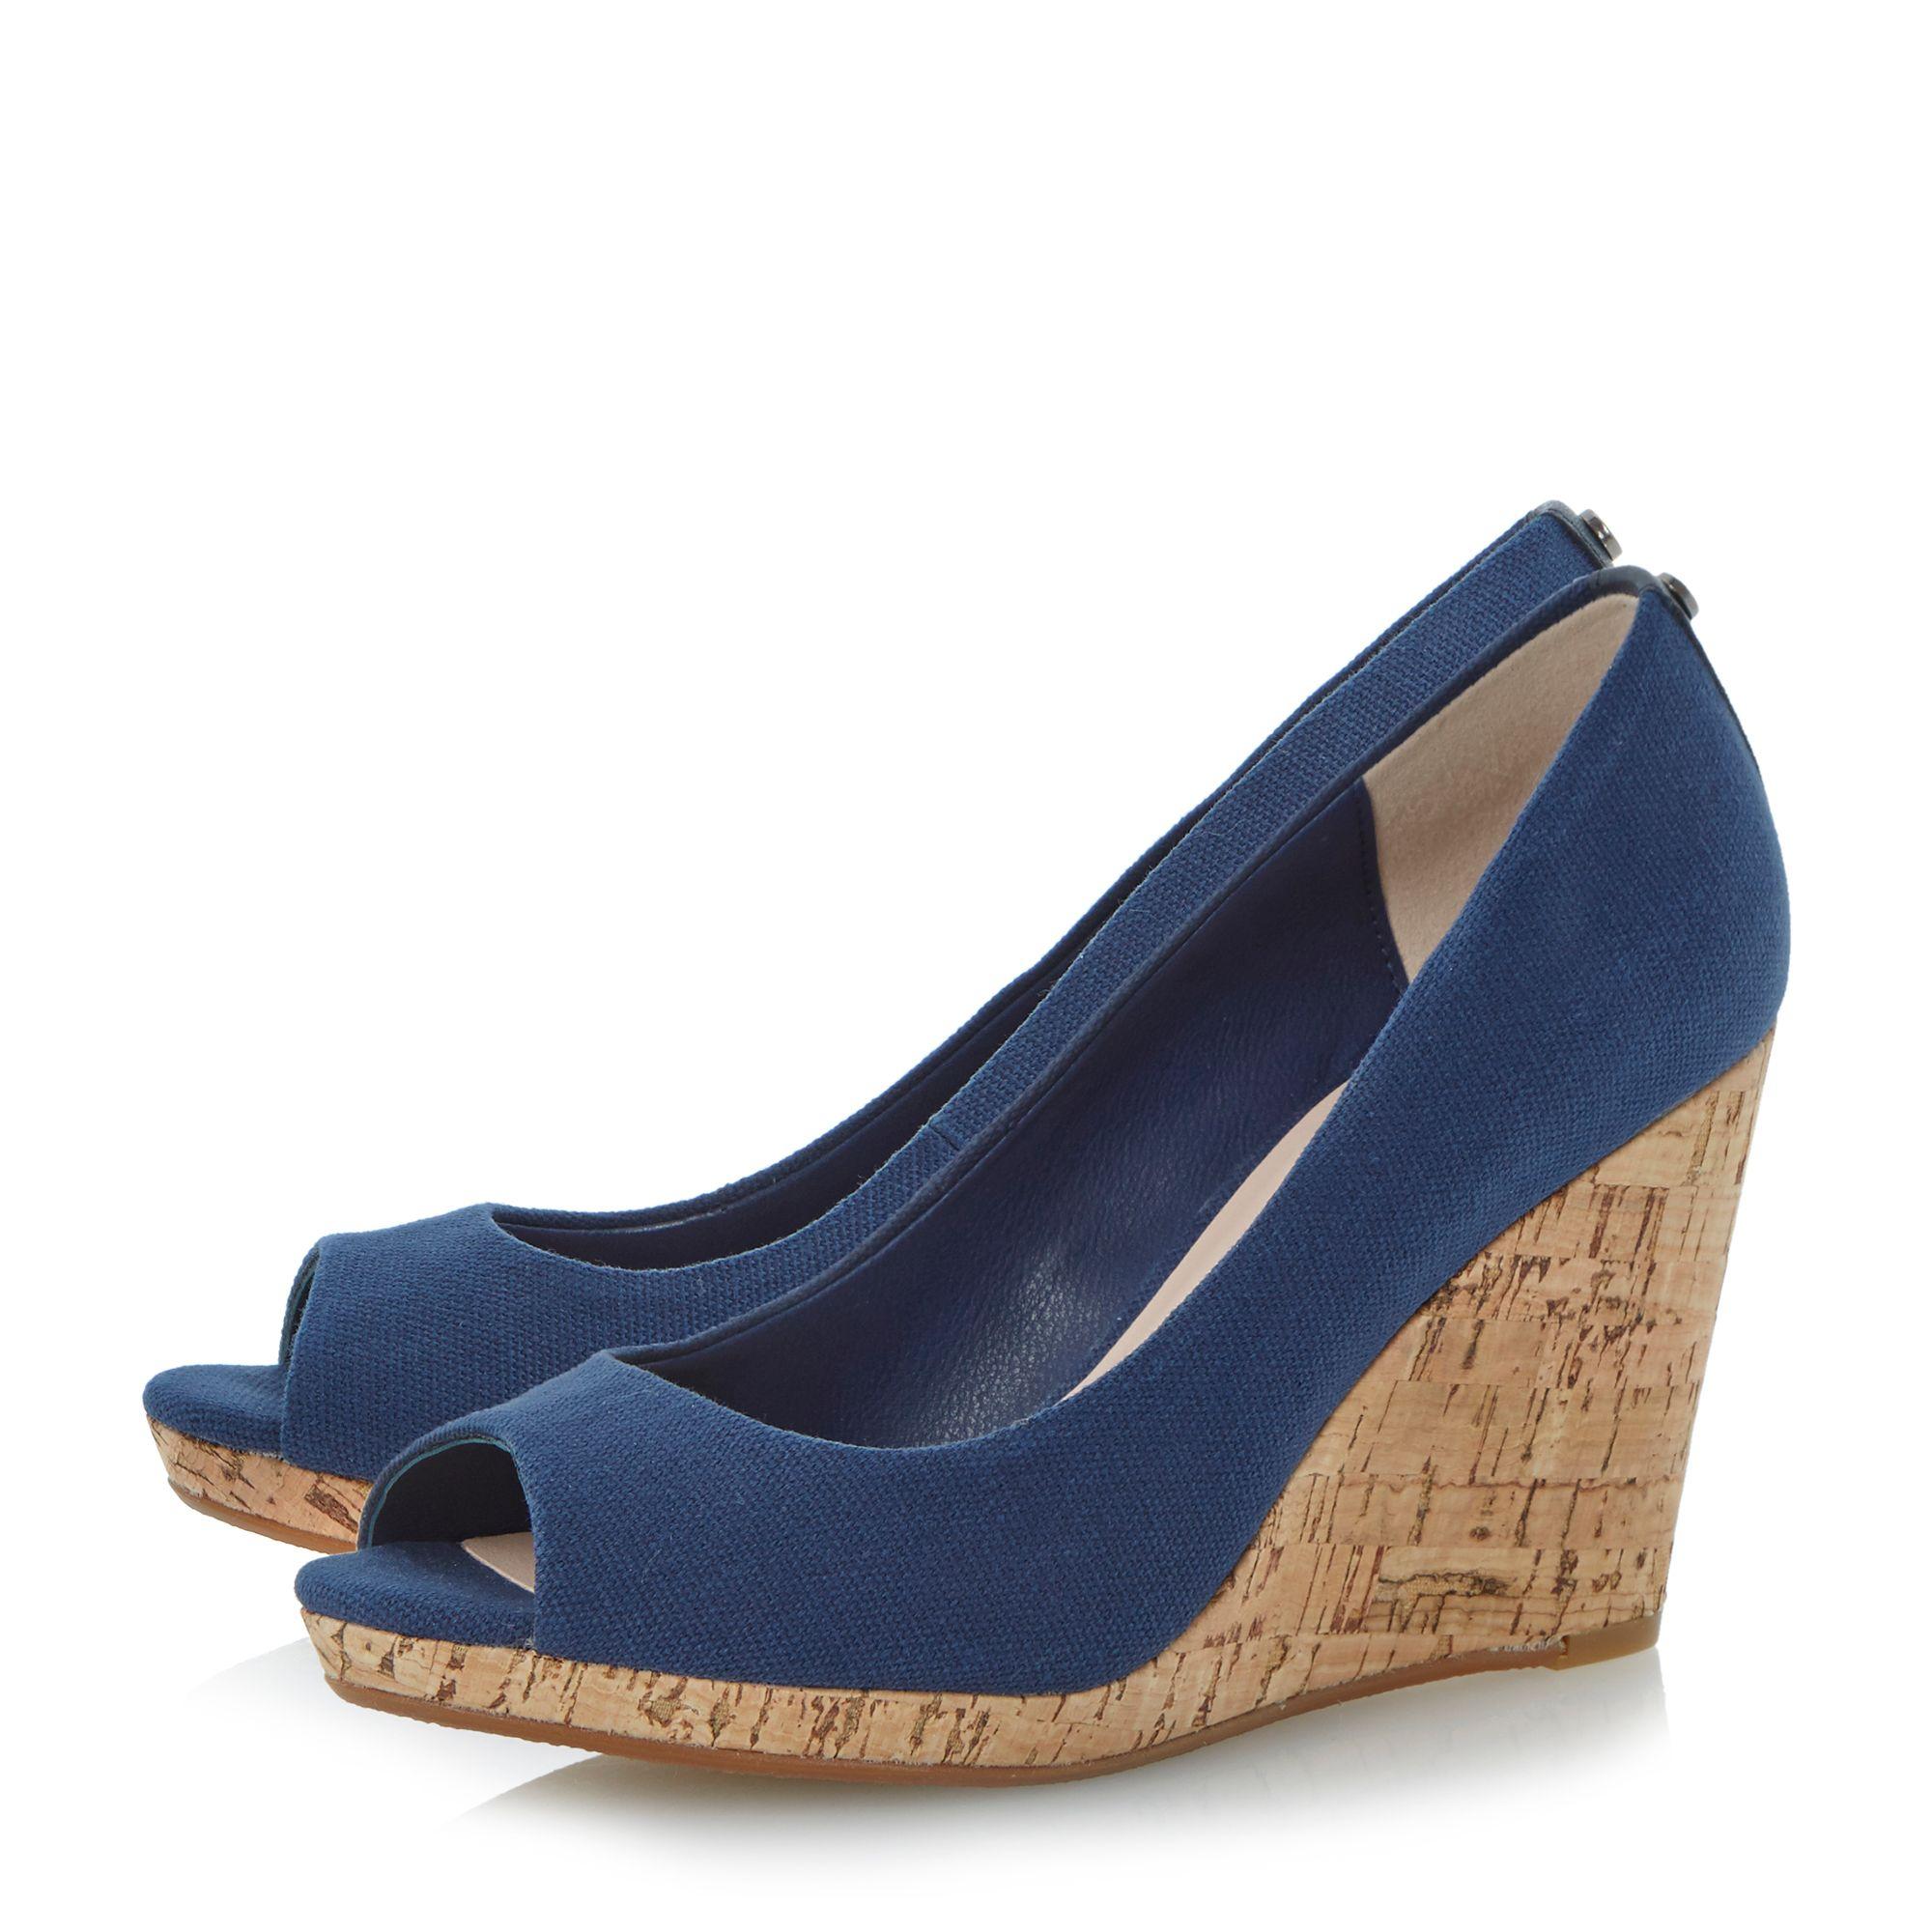 dune celia peeptoe wedge court shoes in blue lyst